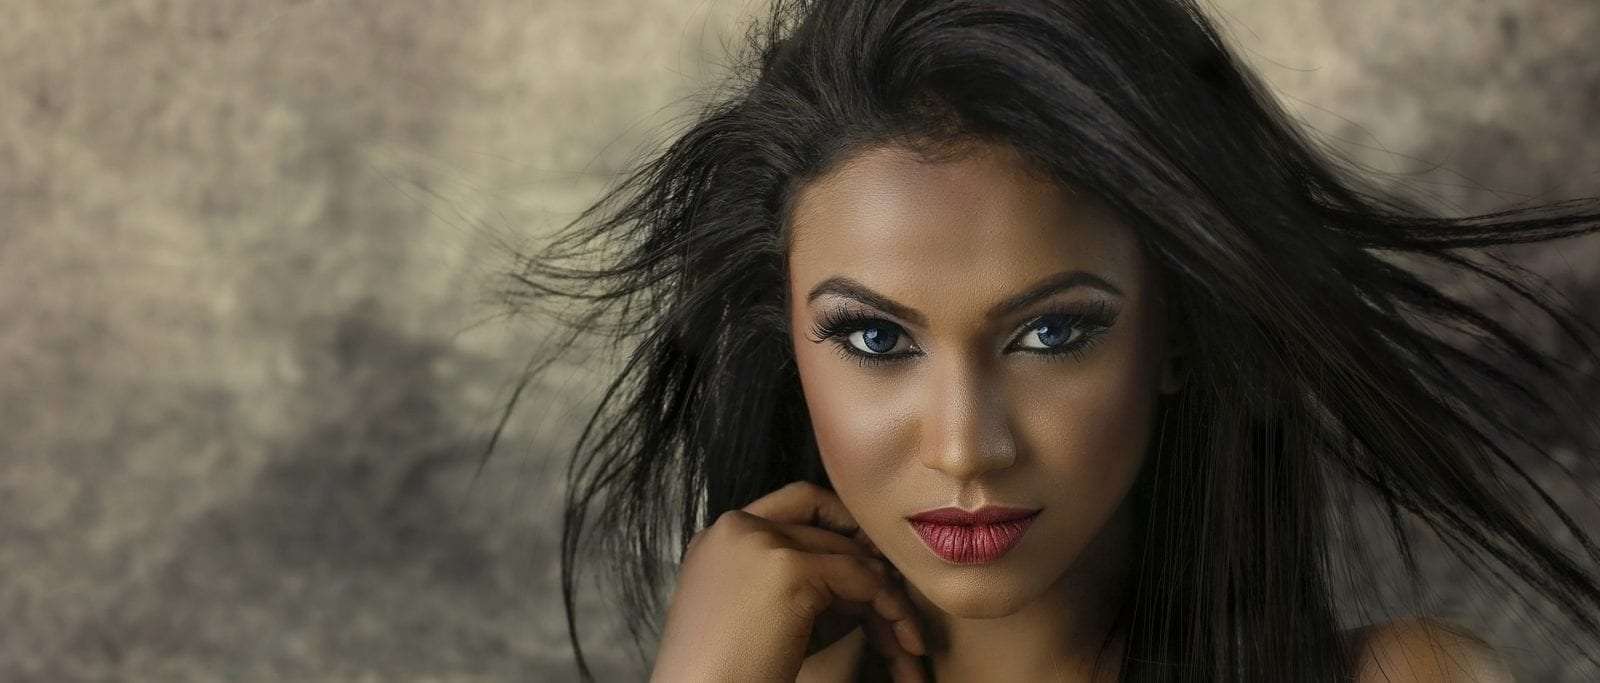 Augen - Kosmetik Artemania - Nail Art - Beauty und Care - Fehraltorf 3